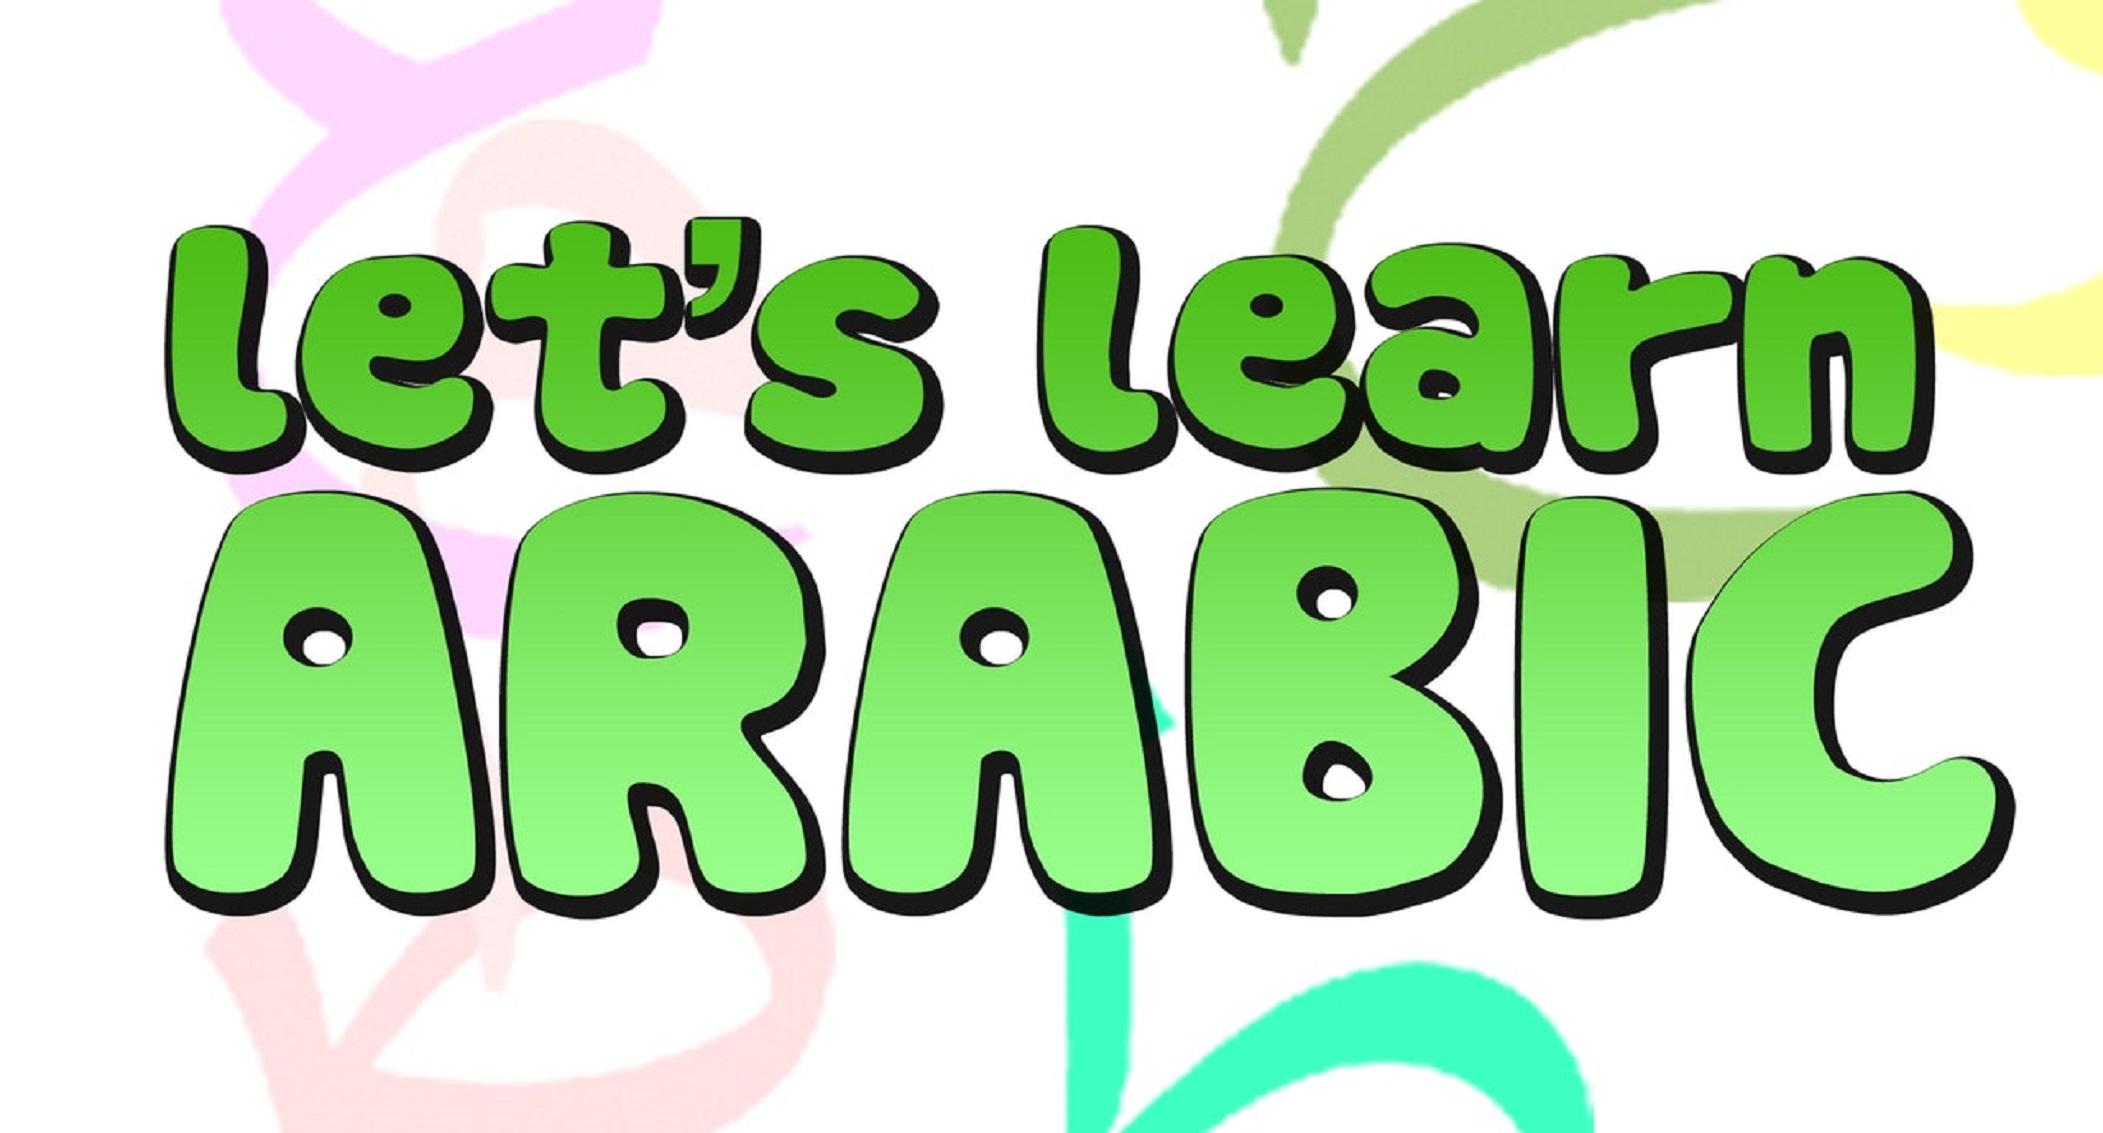 Basic Arabic Grammer & Language Course